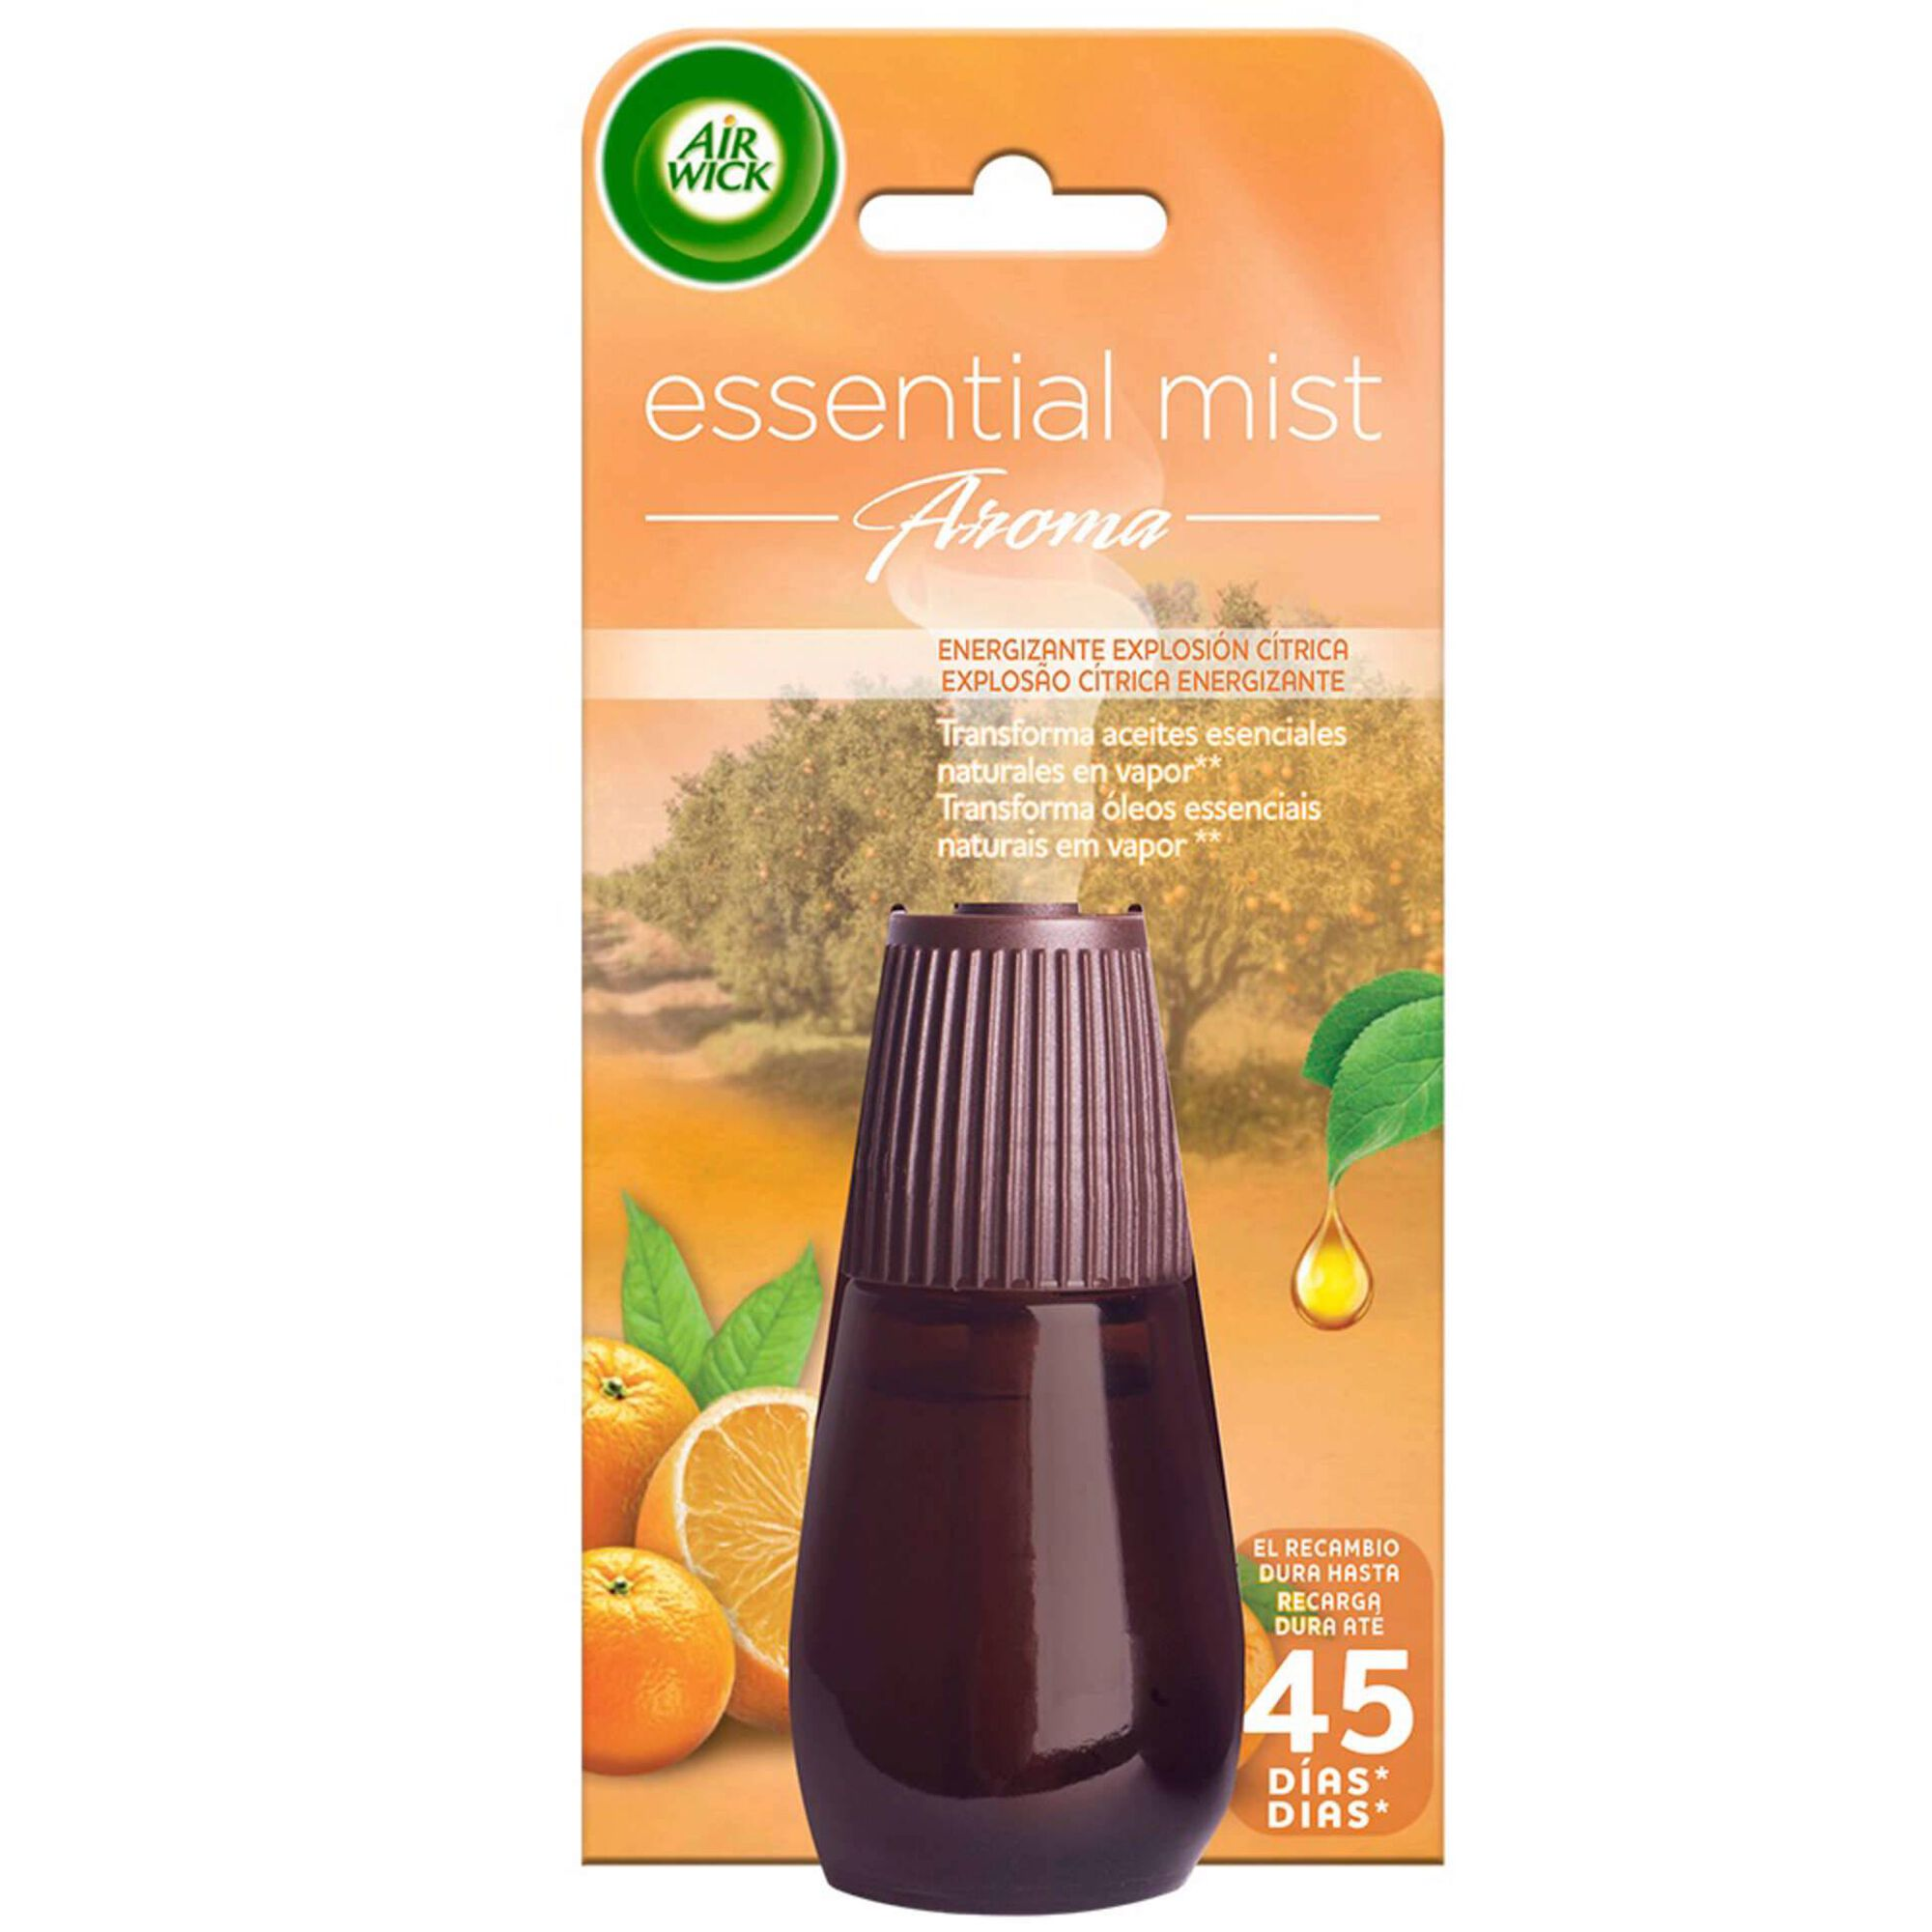 Ambientador Recarga Difusor Essential Mist Citrus